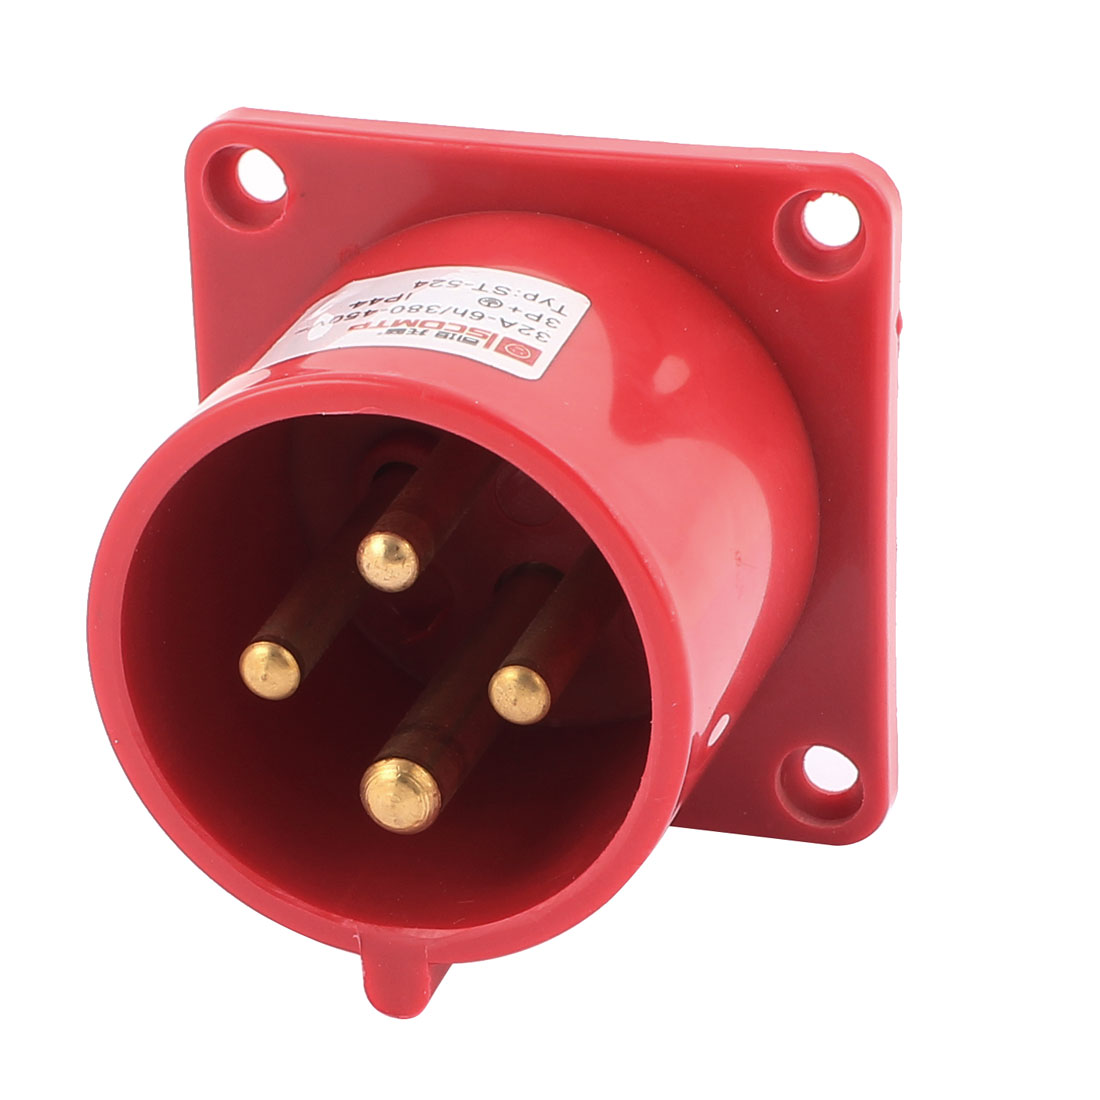 AC 380V-450V 32A IP44 3P+E 4P Male Industrial Consealing Plug